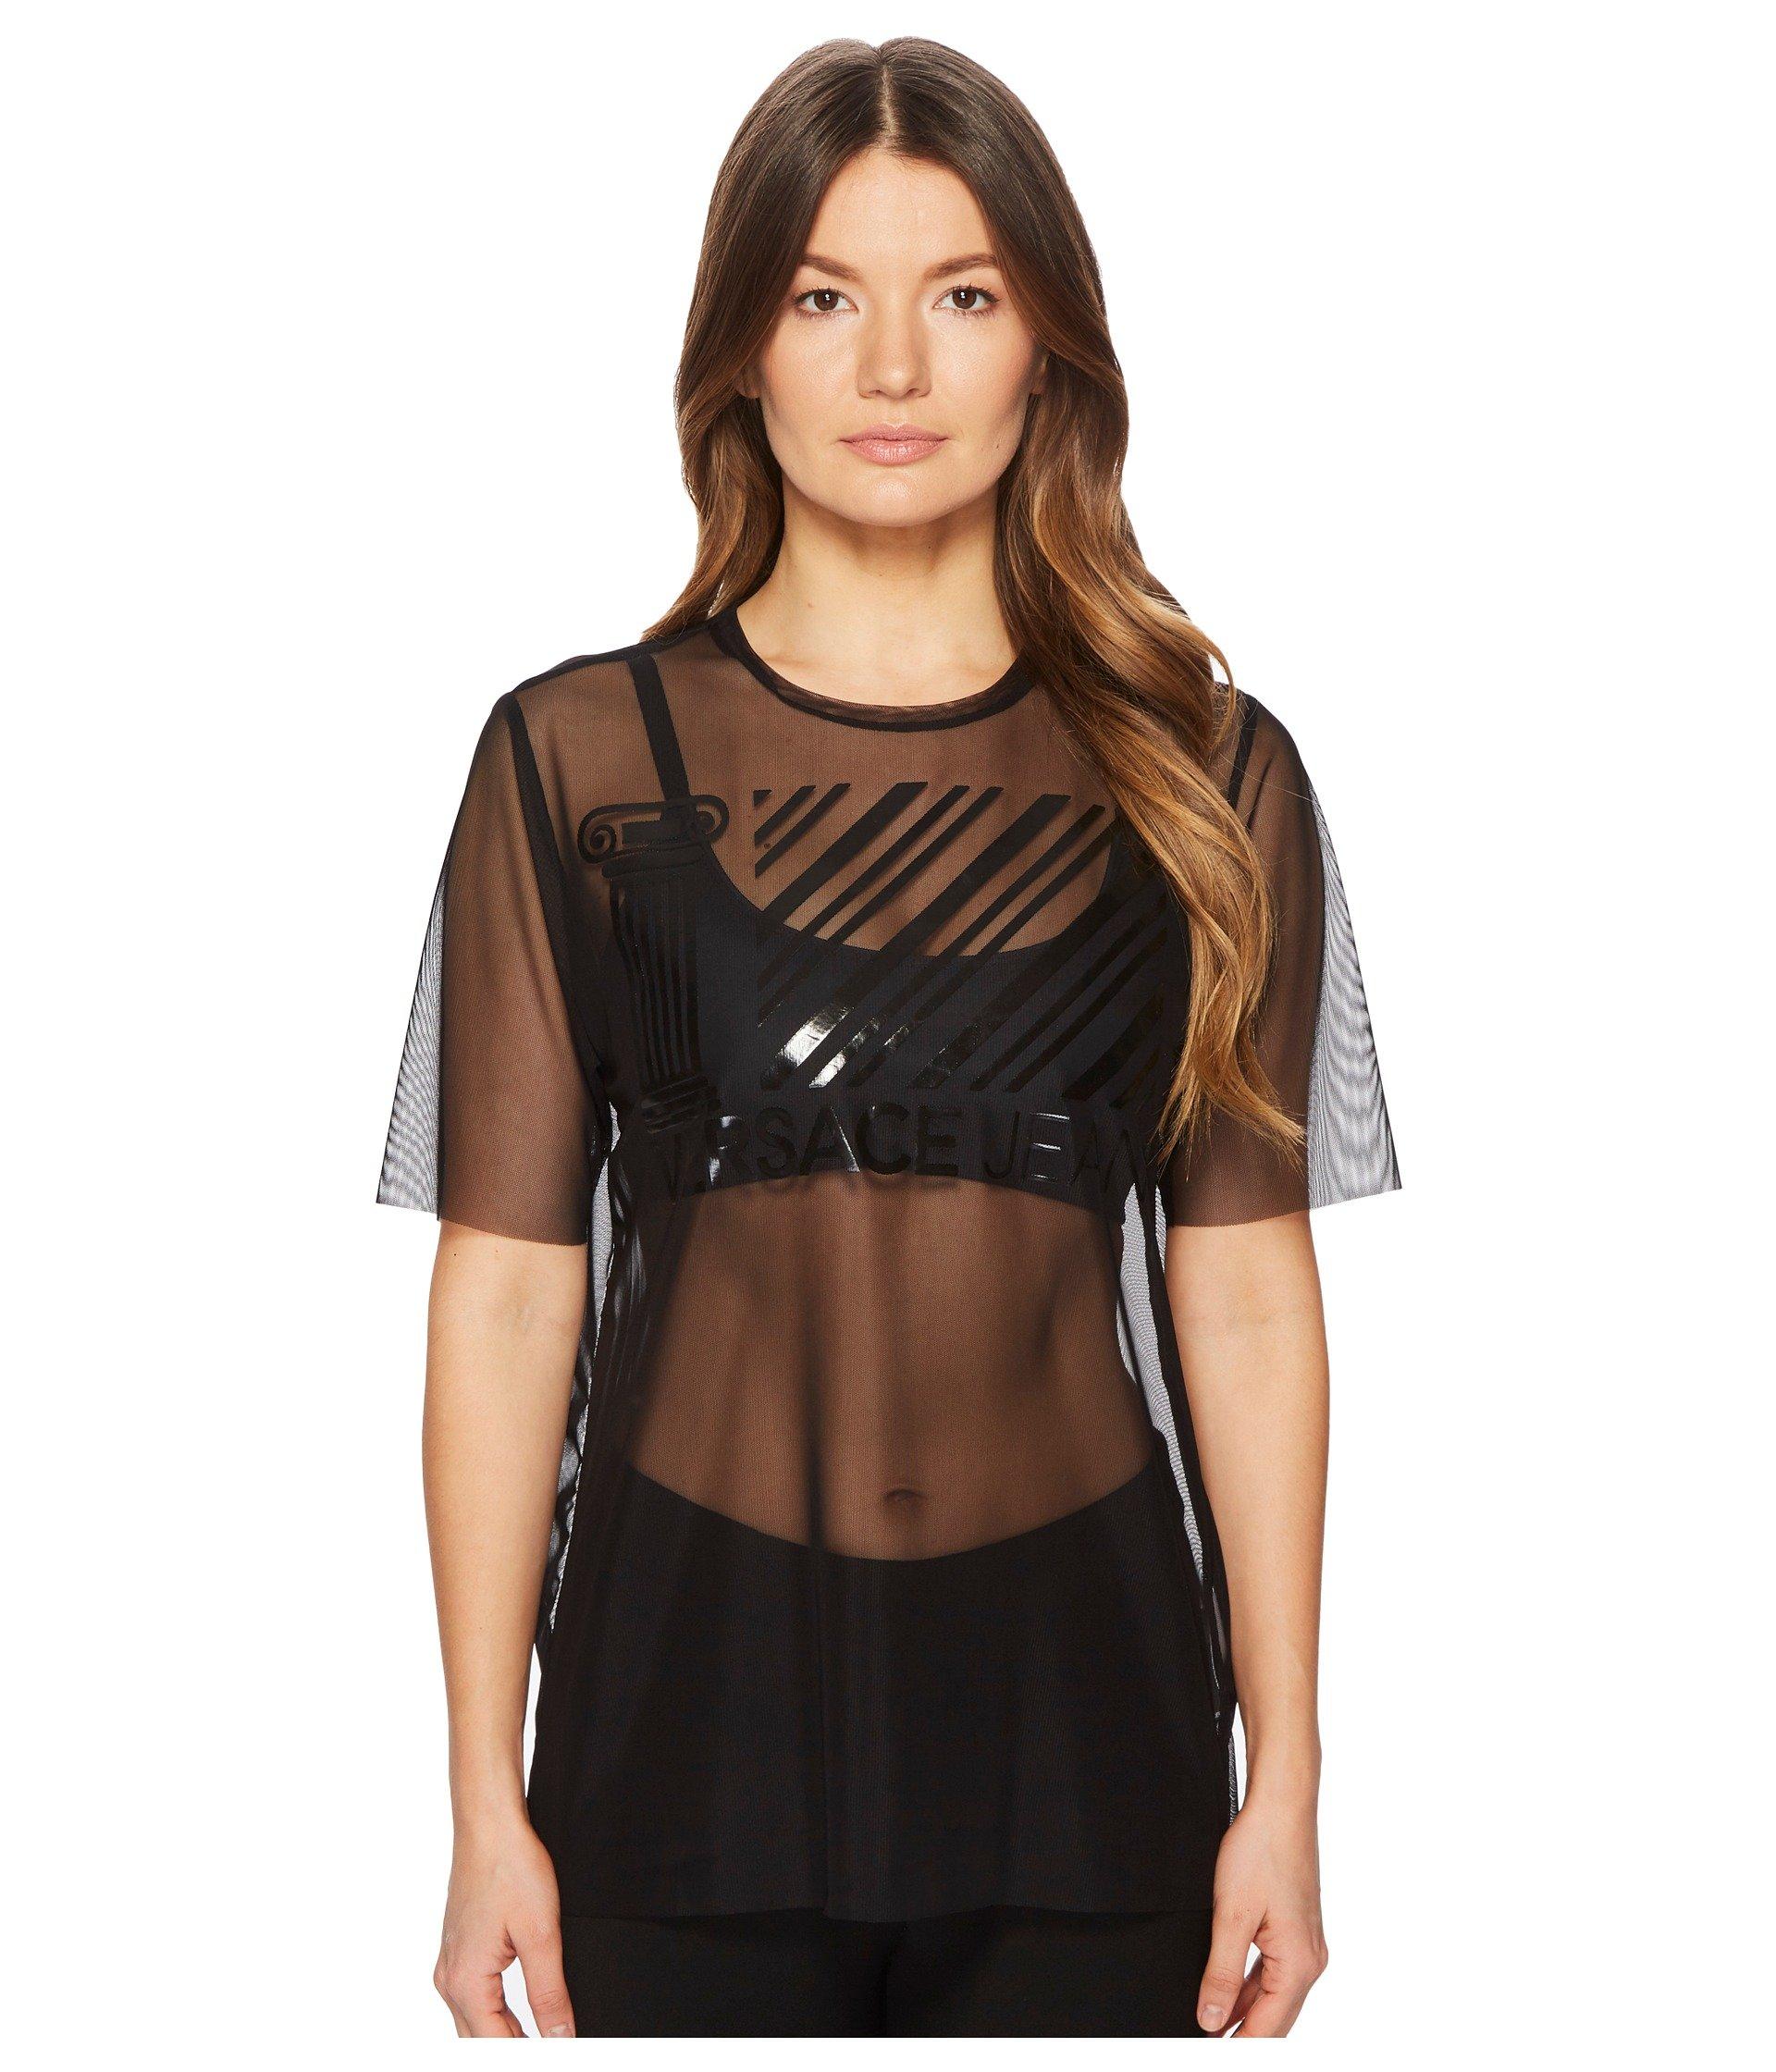 Blusa para Mujer Versace Jeans Sheer Designed Brand Short Sleeve Top  + Versace en VeoyCompro.net